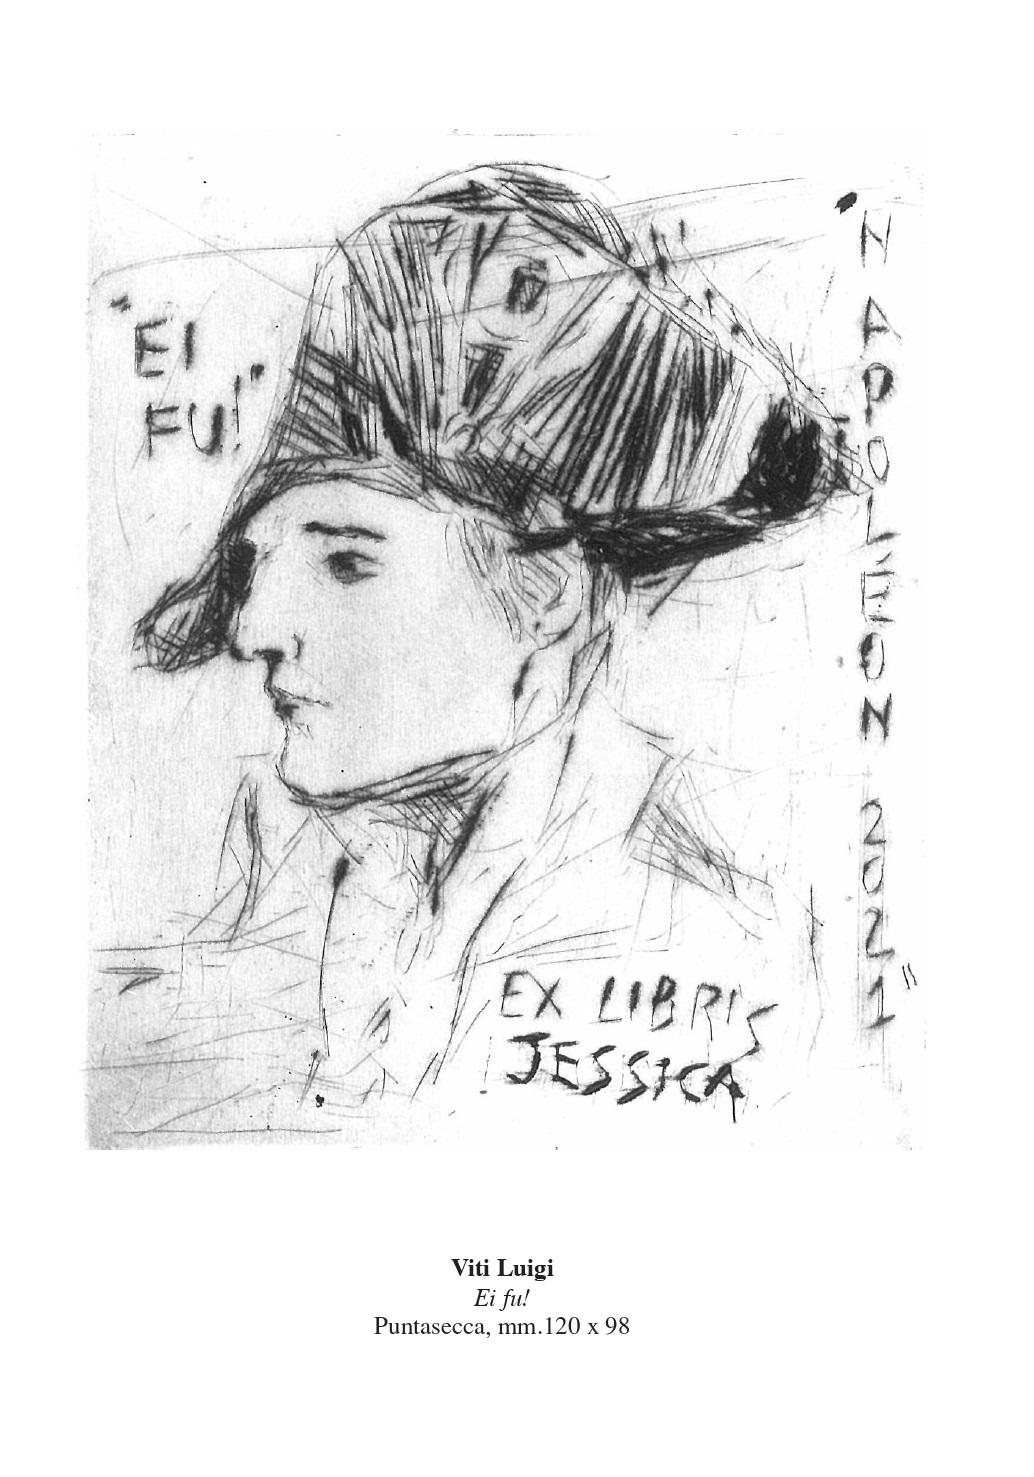 CATALOGO exlibris 2021-147_page-0001